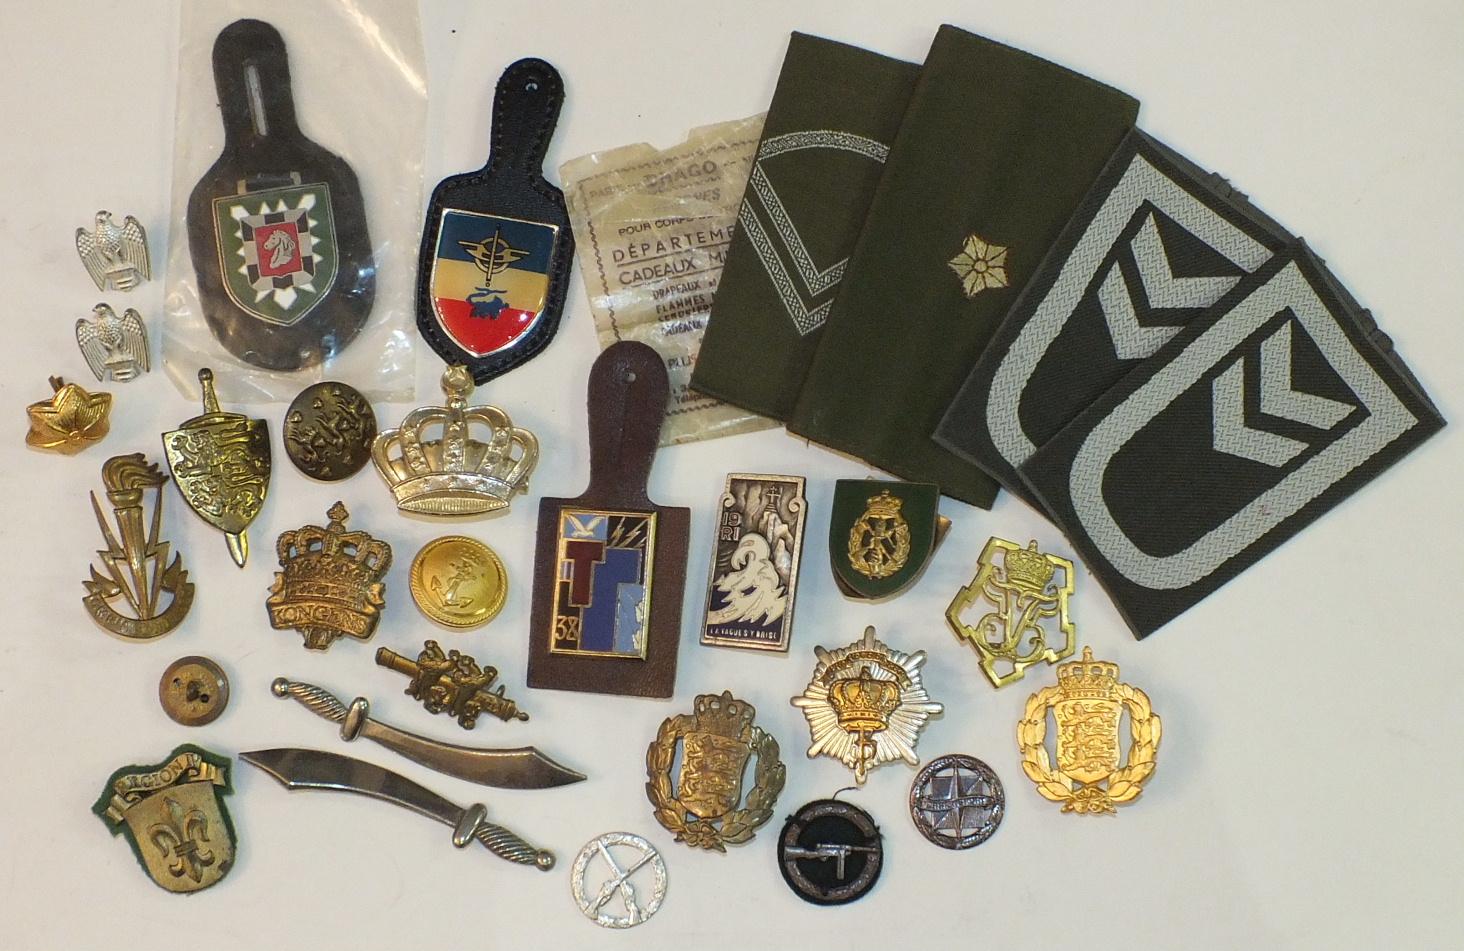 Lot 143 - An enamelled white metal badge for 19ièm Régiment D'Infanterie (France), by Drago, Paris and other